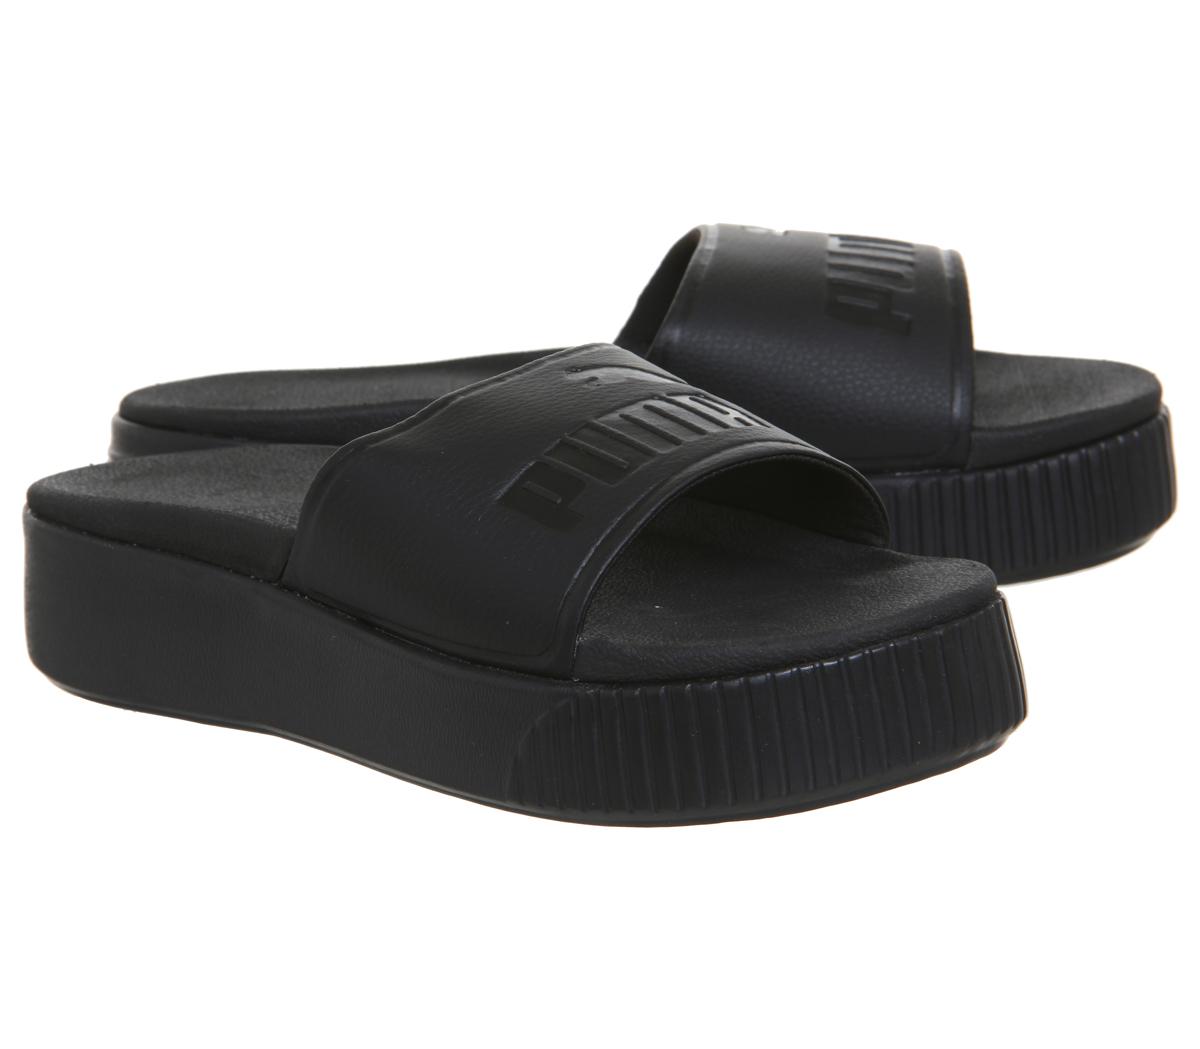 695505505c0 Womens Puma Platform Slides Puma Black Puma Black Sandals